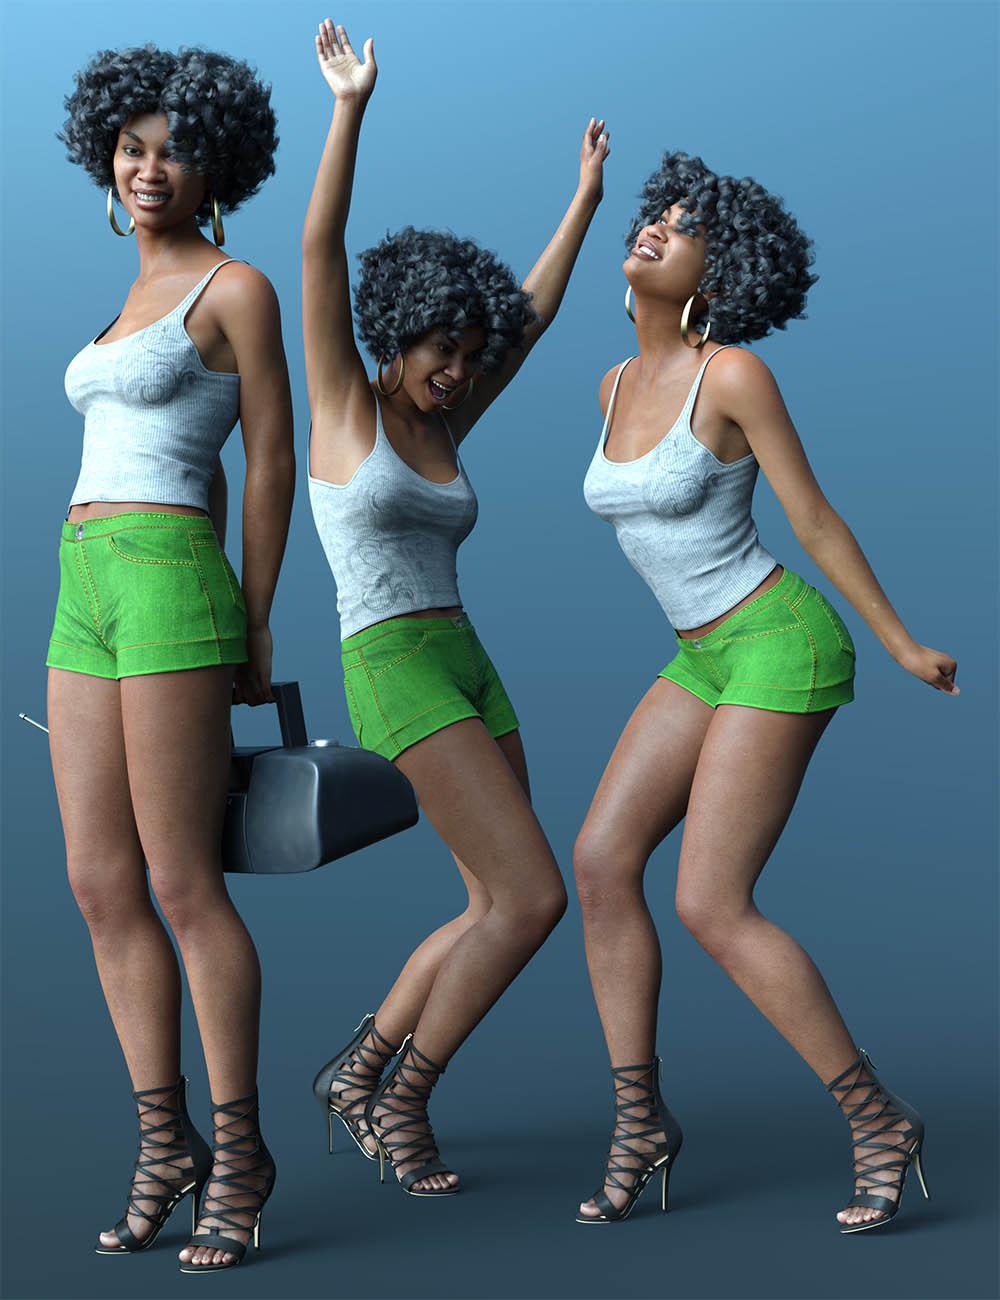 CDI Seventies Poses for Genesis 8.1 Female by: Capsces Digital Ink, 3D Models by Daz 3D